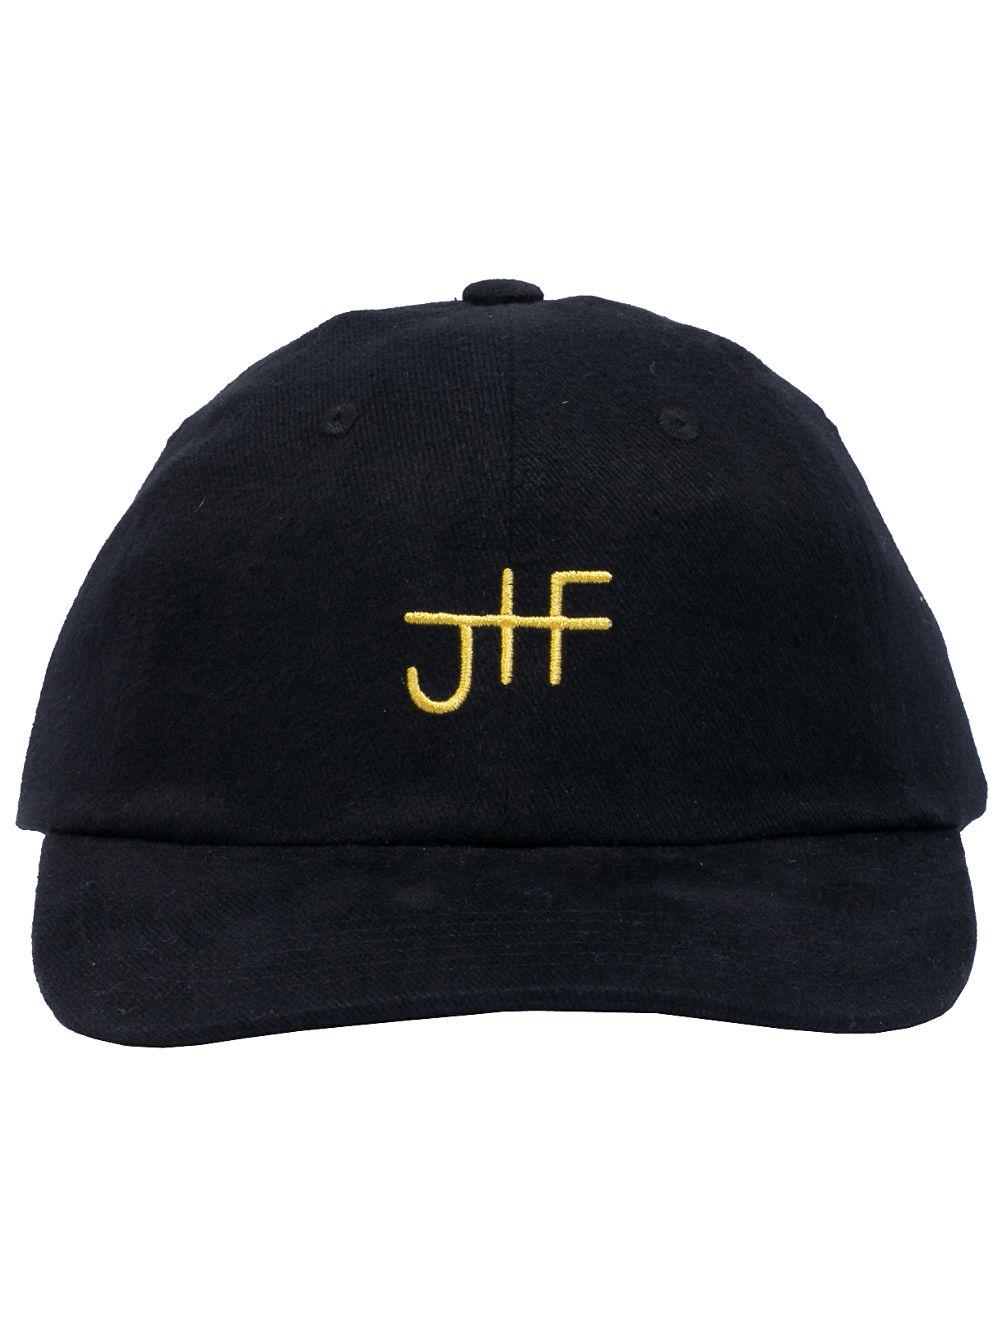 56719ec89ed Buy JHF Back 2 Basics Cap online at blue-tomato.com